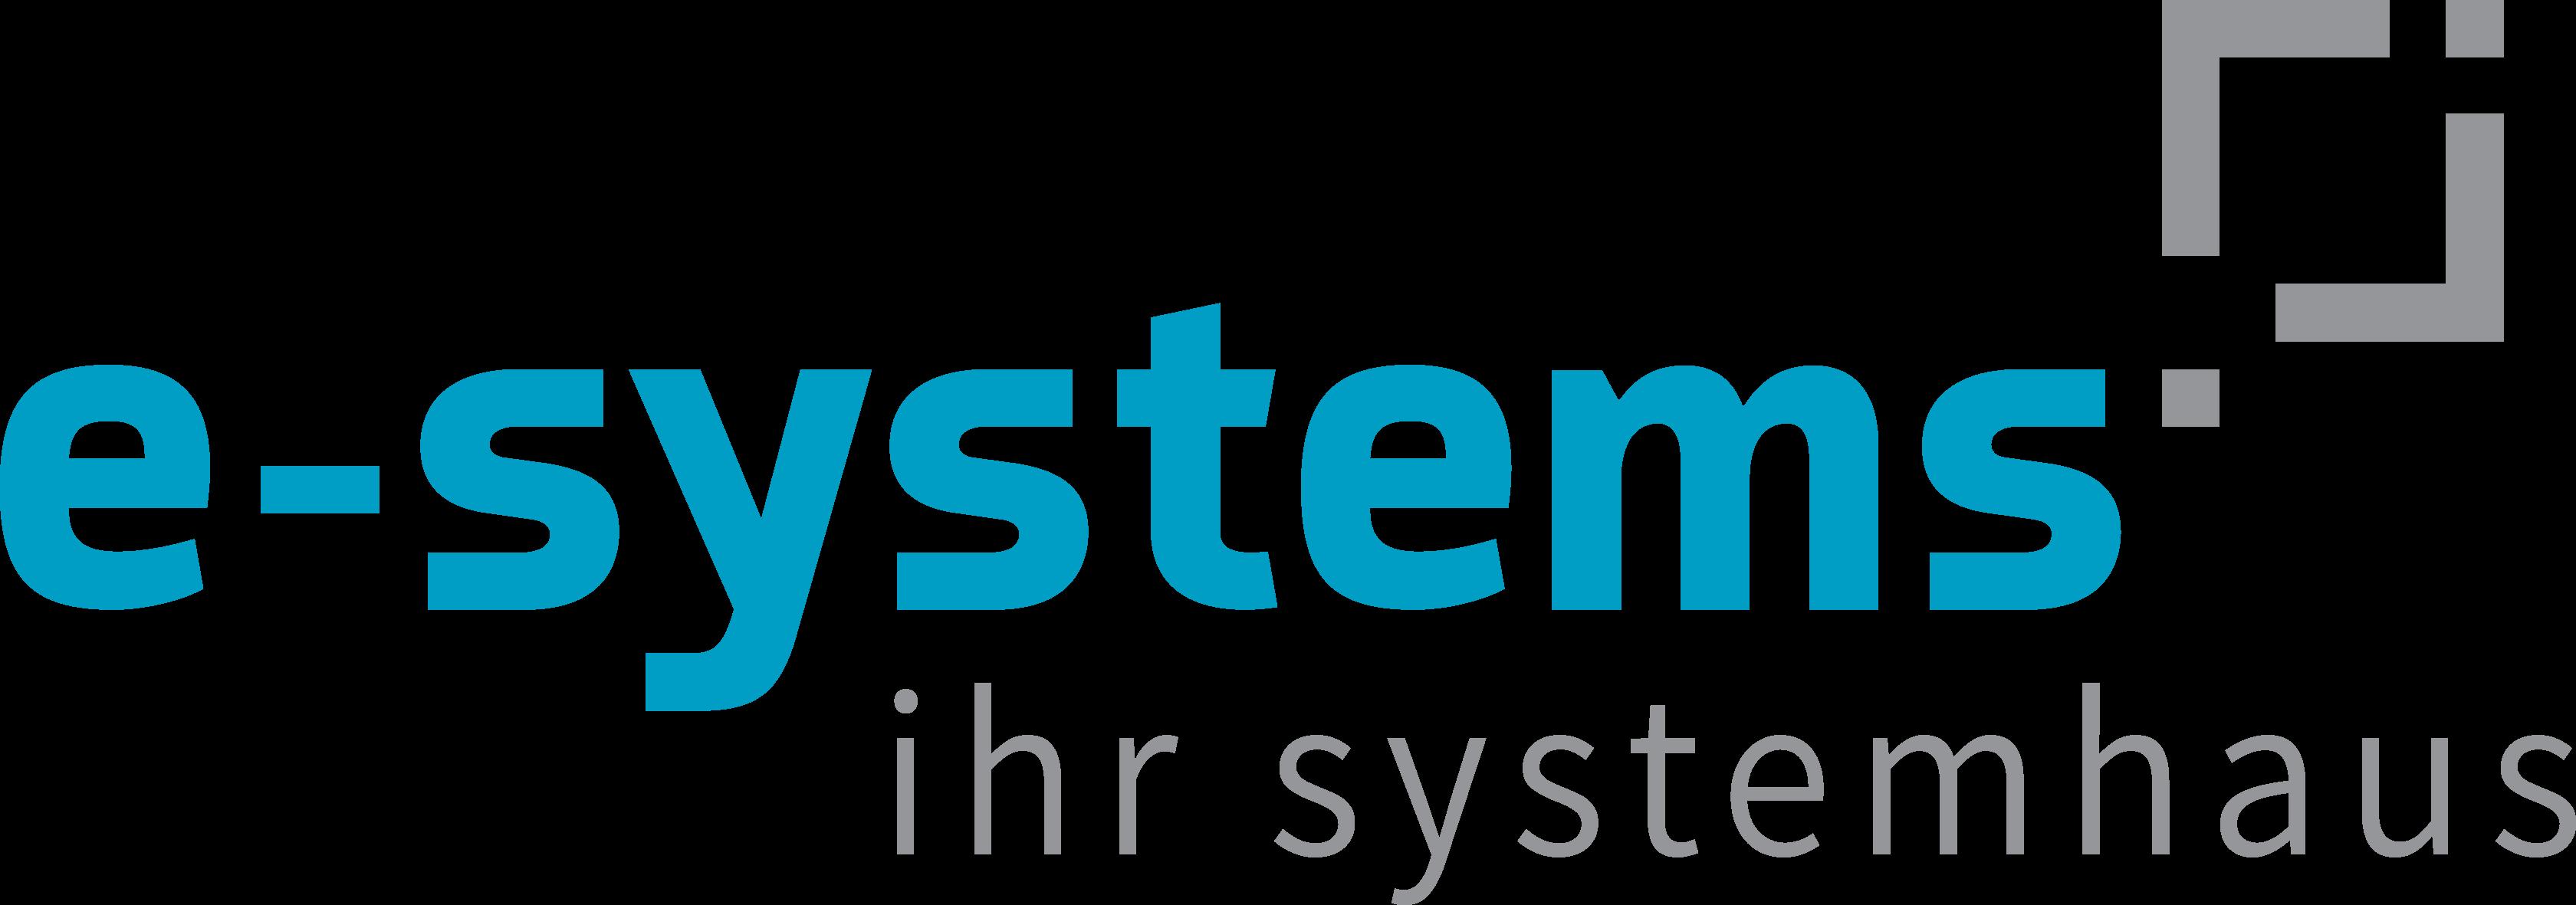 e systems logo